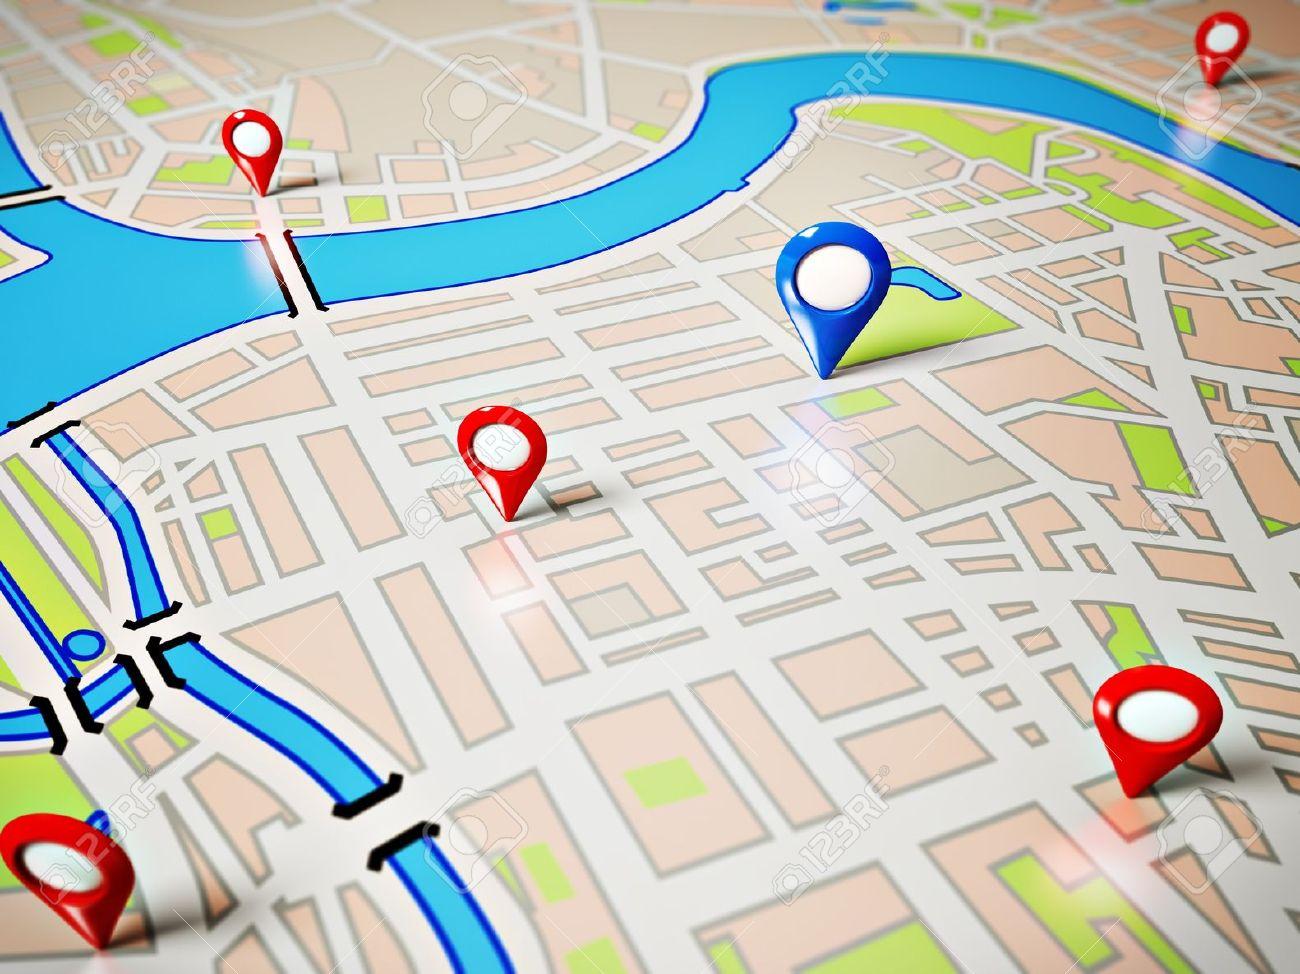 Ways to hack GPS location of iPhone in various methods